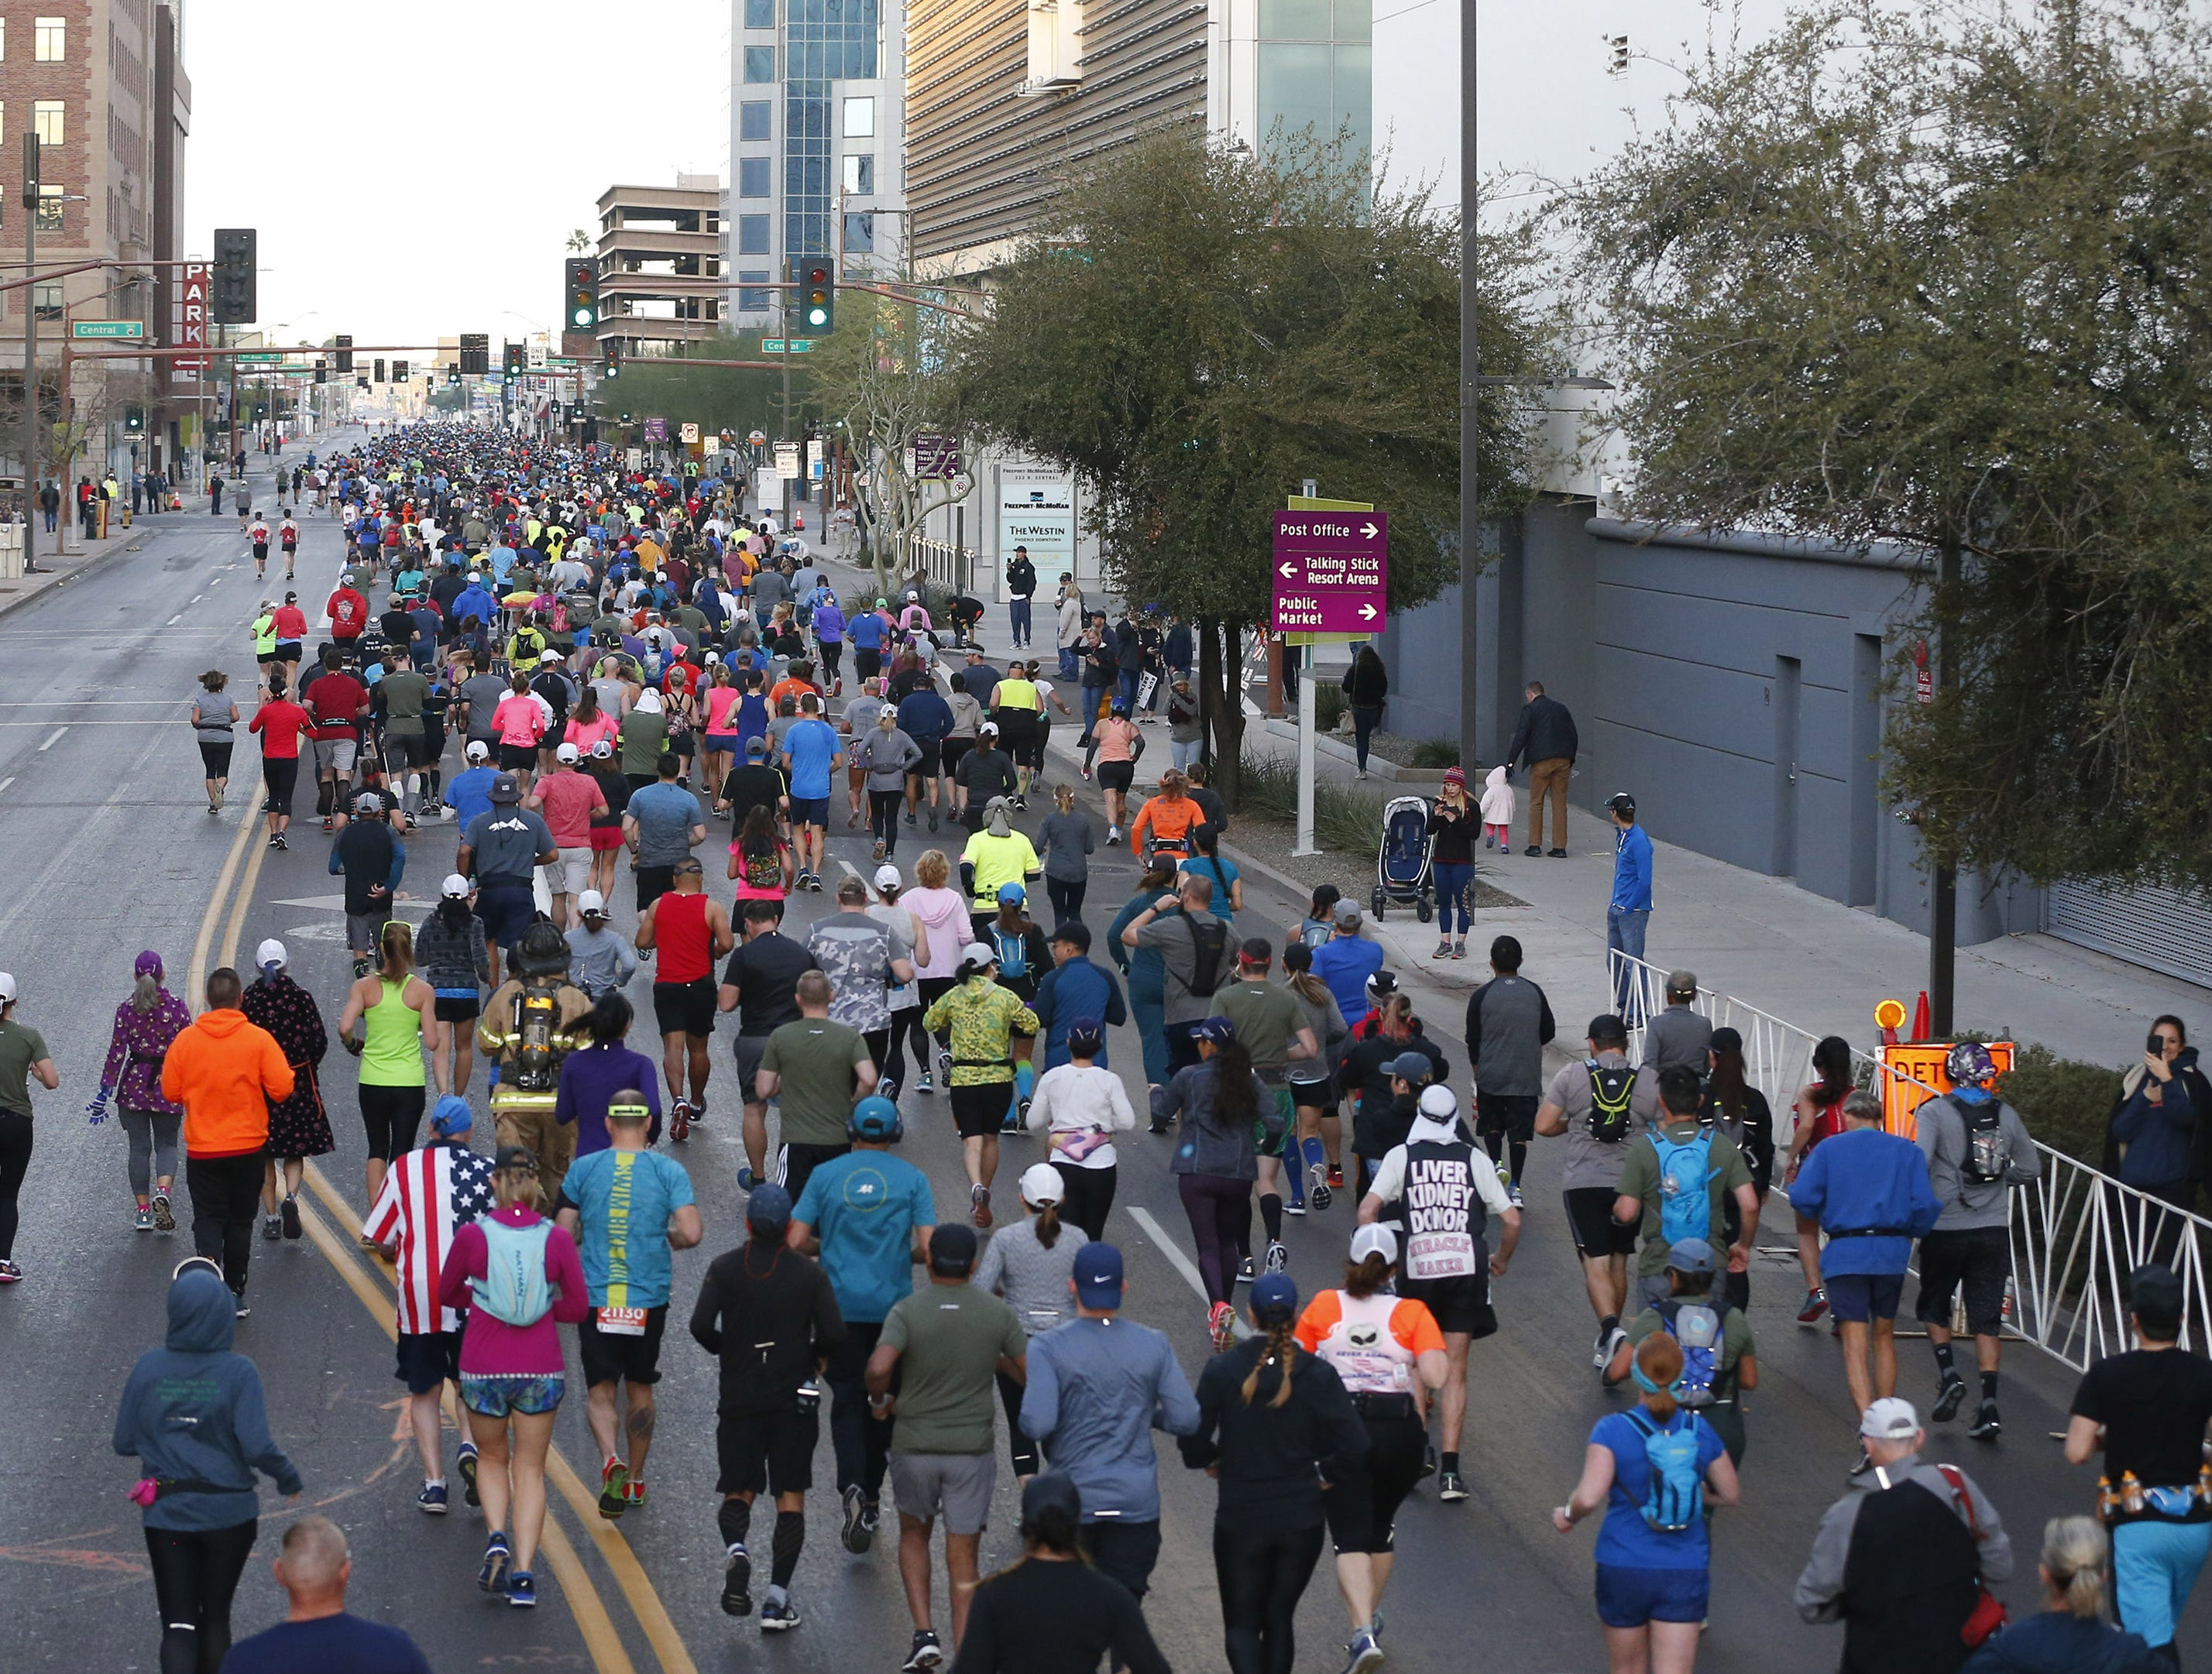 Runners make their way down Van Buren St. during the Rock 'n' Roll Marathon in Phoenix, Jan. 20, 2019.